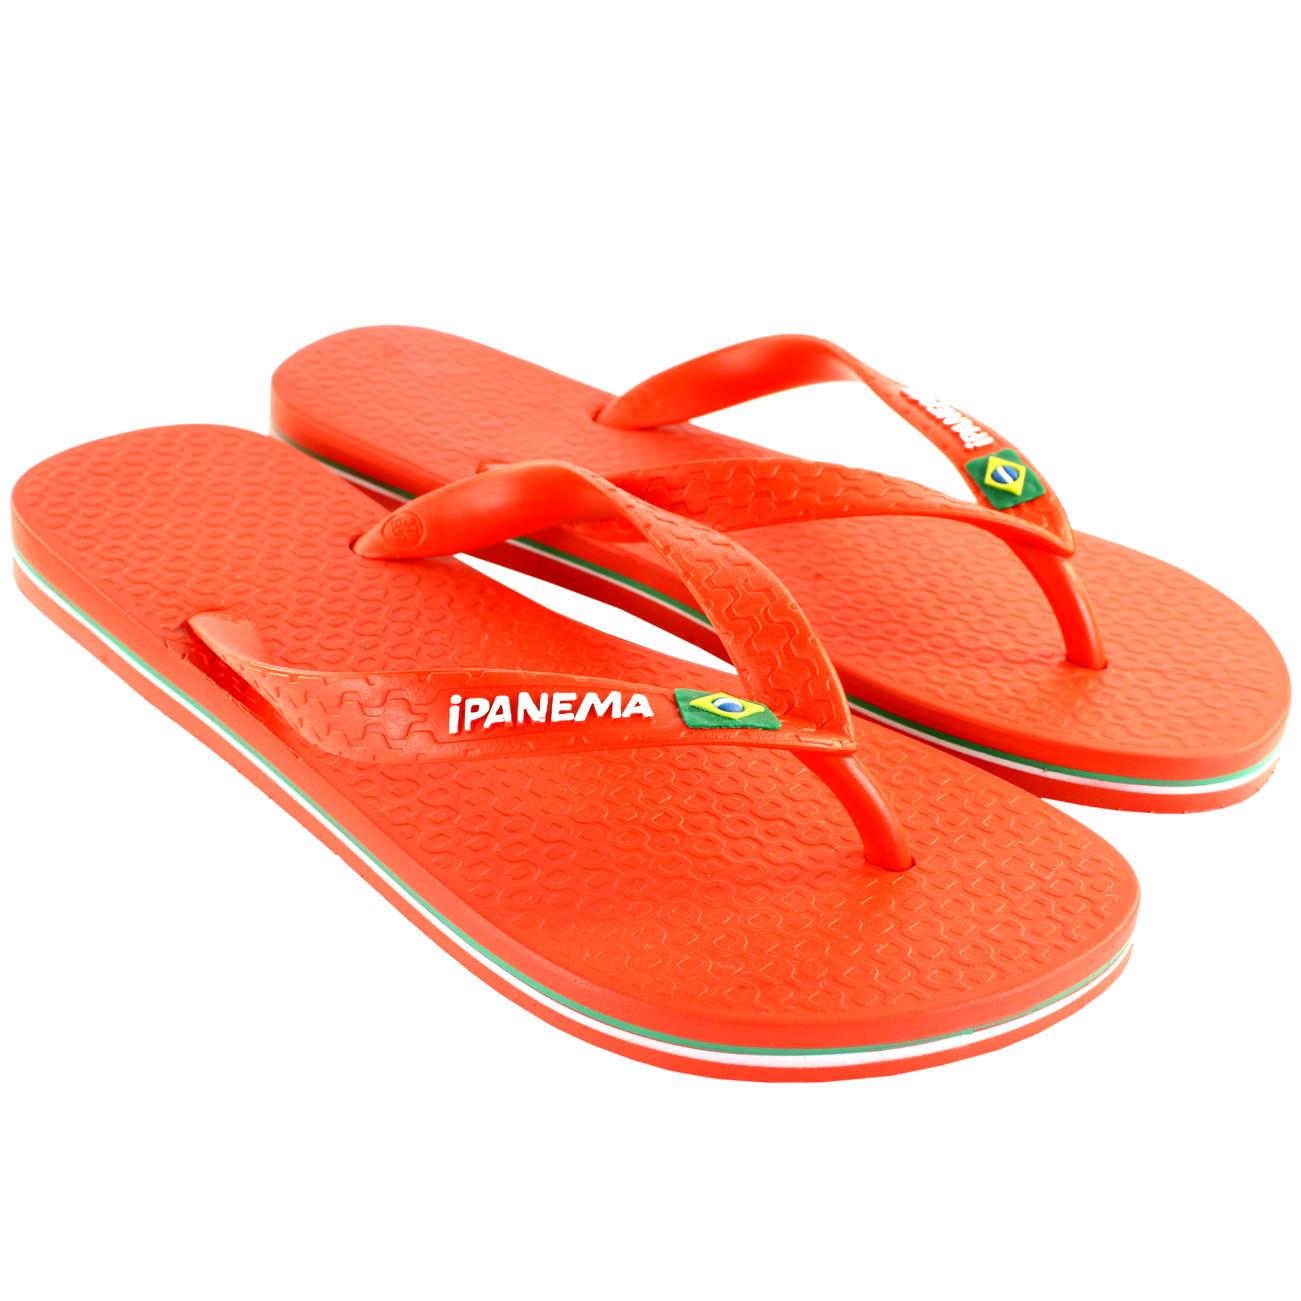 damen schuhe ipanema brazil flip flops sandale designer flipflops eu sizes 36 41. Black Bedroom Furniture Sets. Home Design Ideas